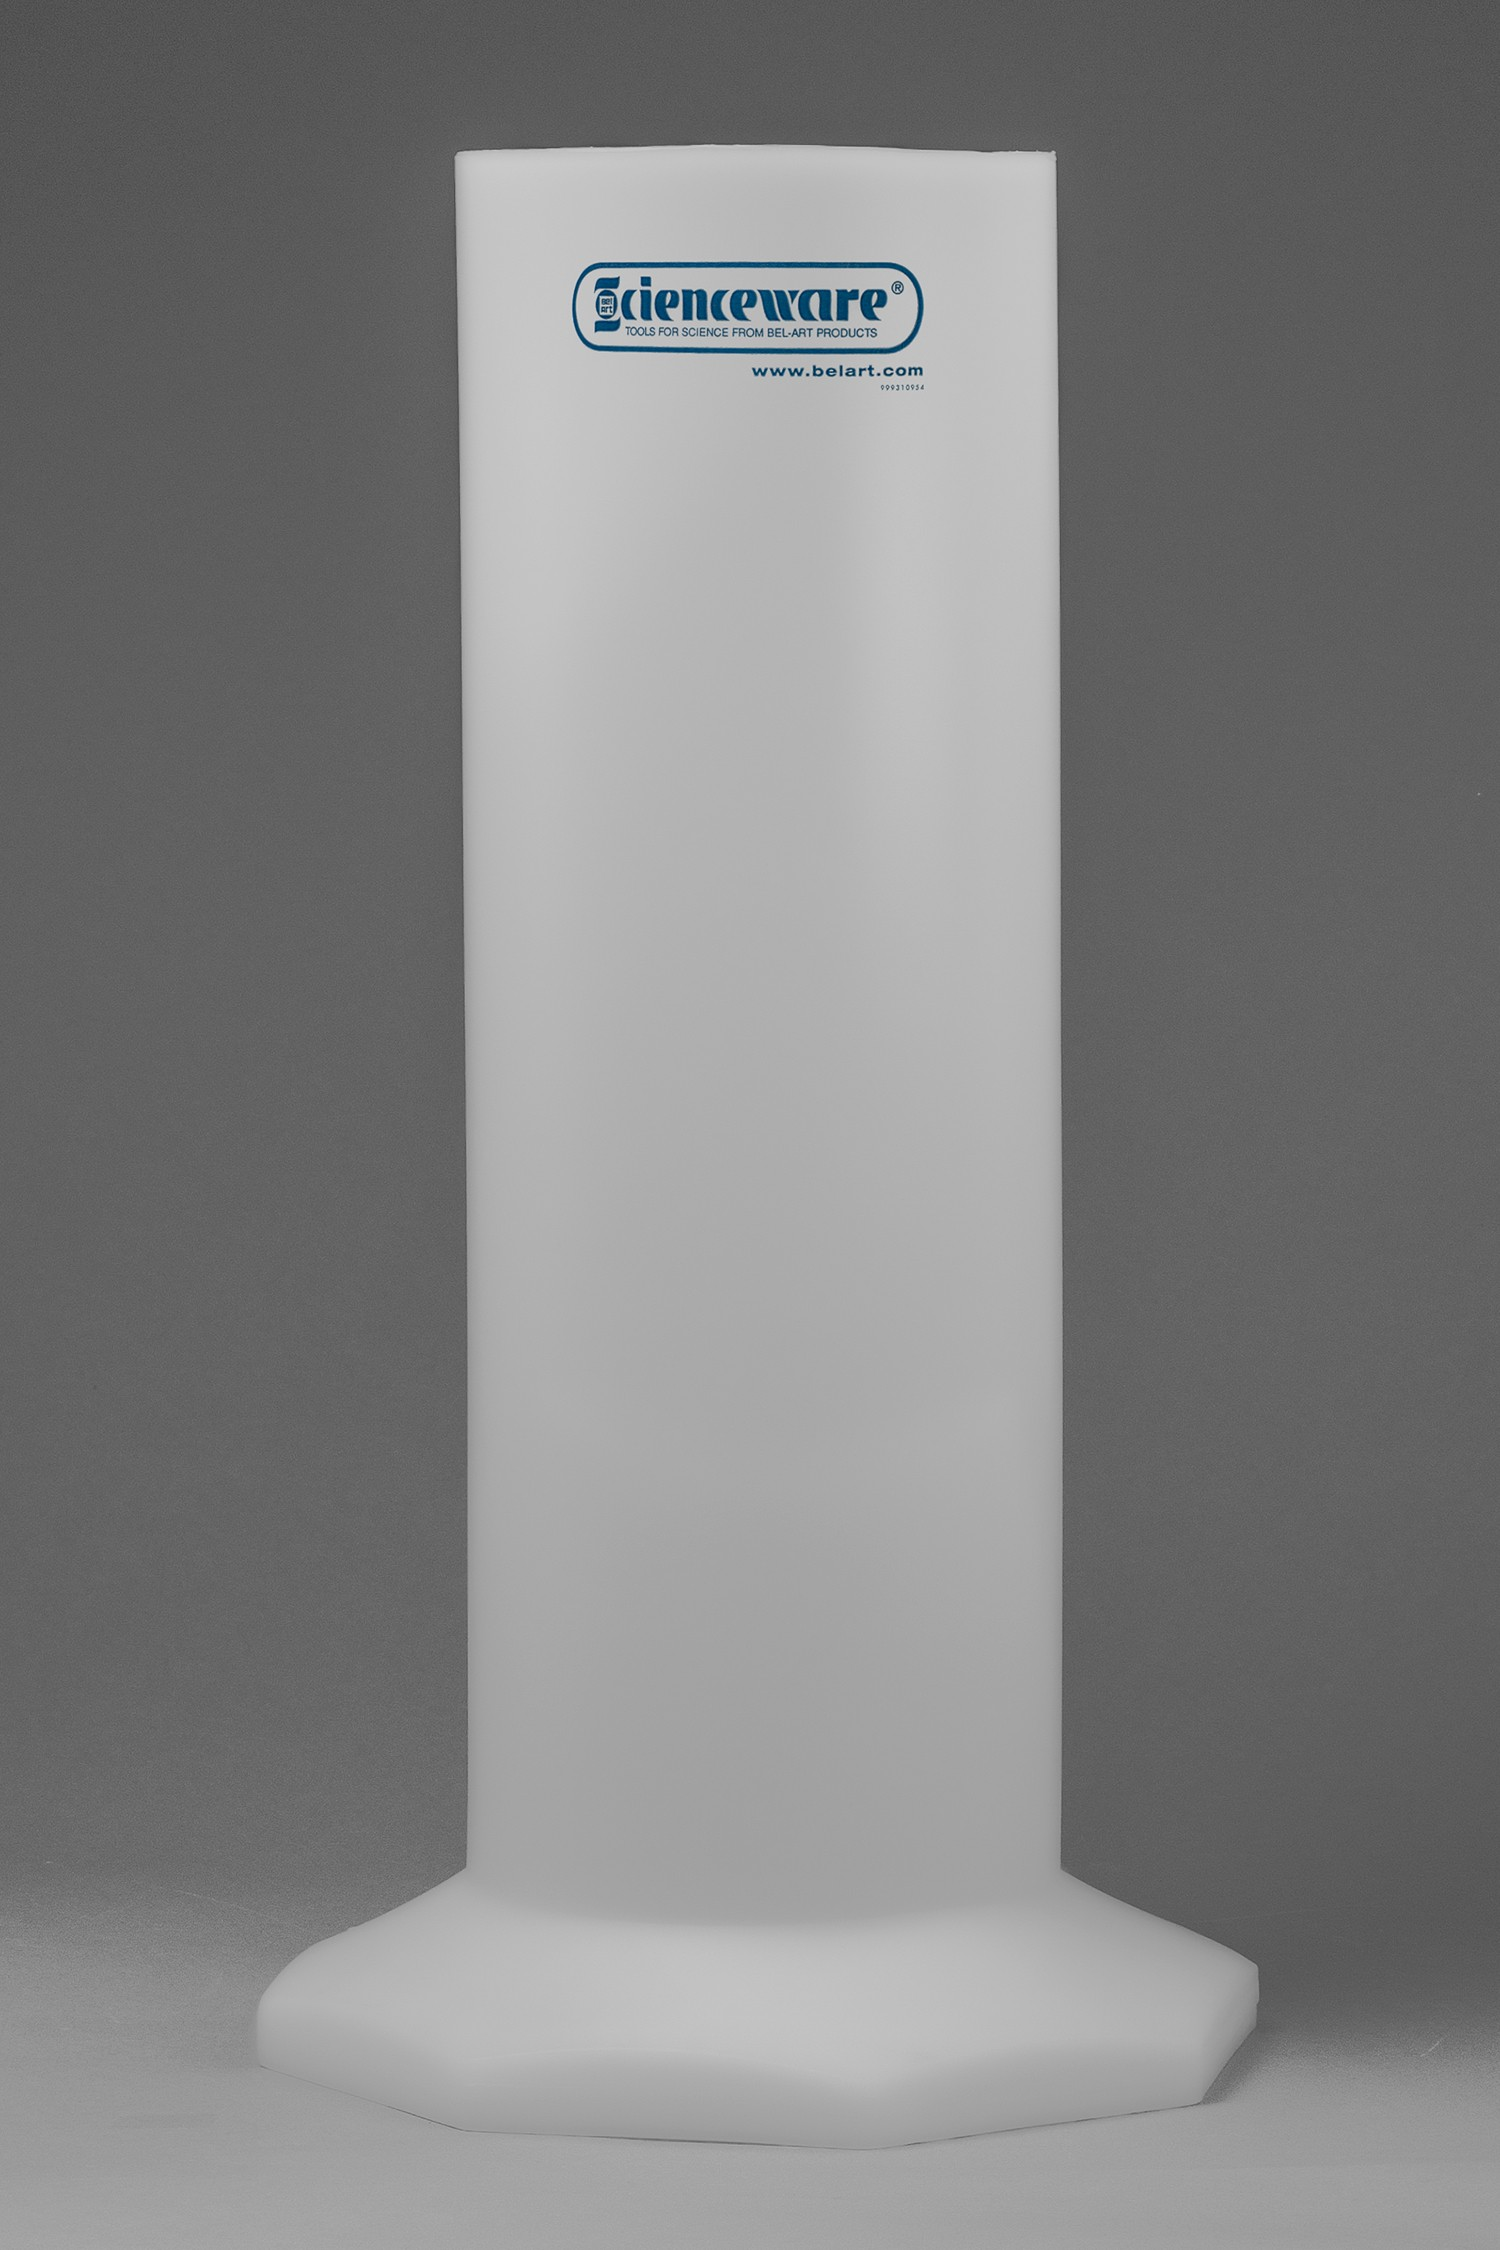 SP Bel-Art Polyethylene Pipette Jar (6 x 18 in.) for Cleanware Pipette Rinsing System